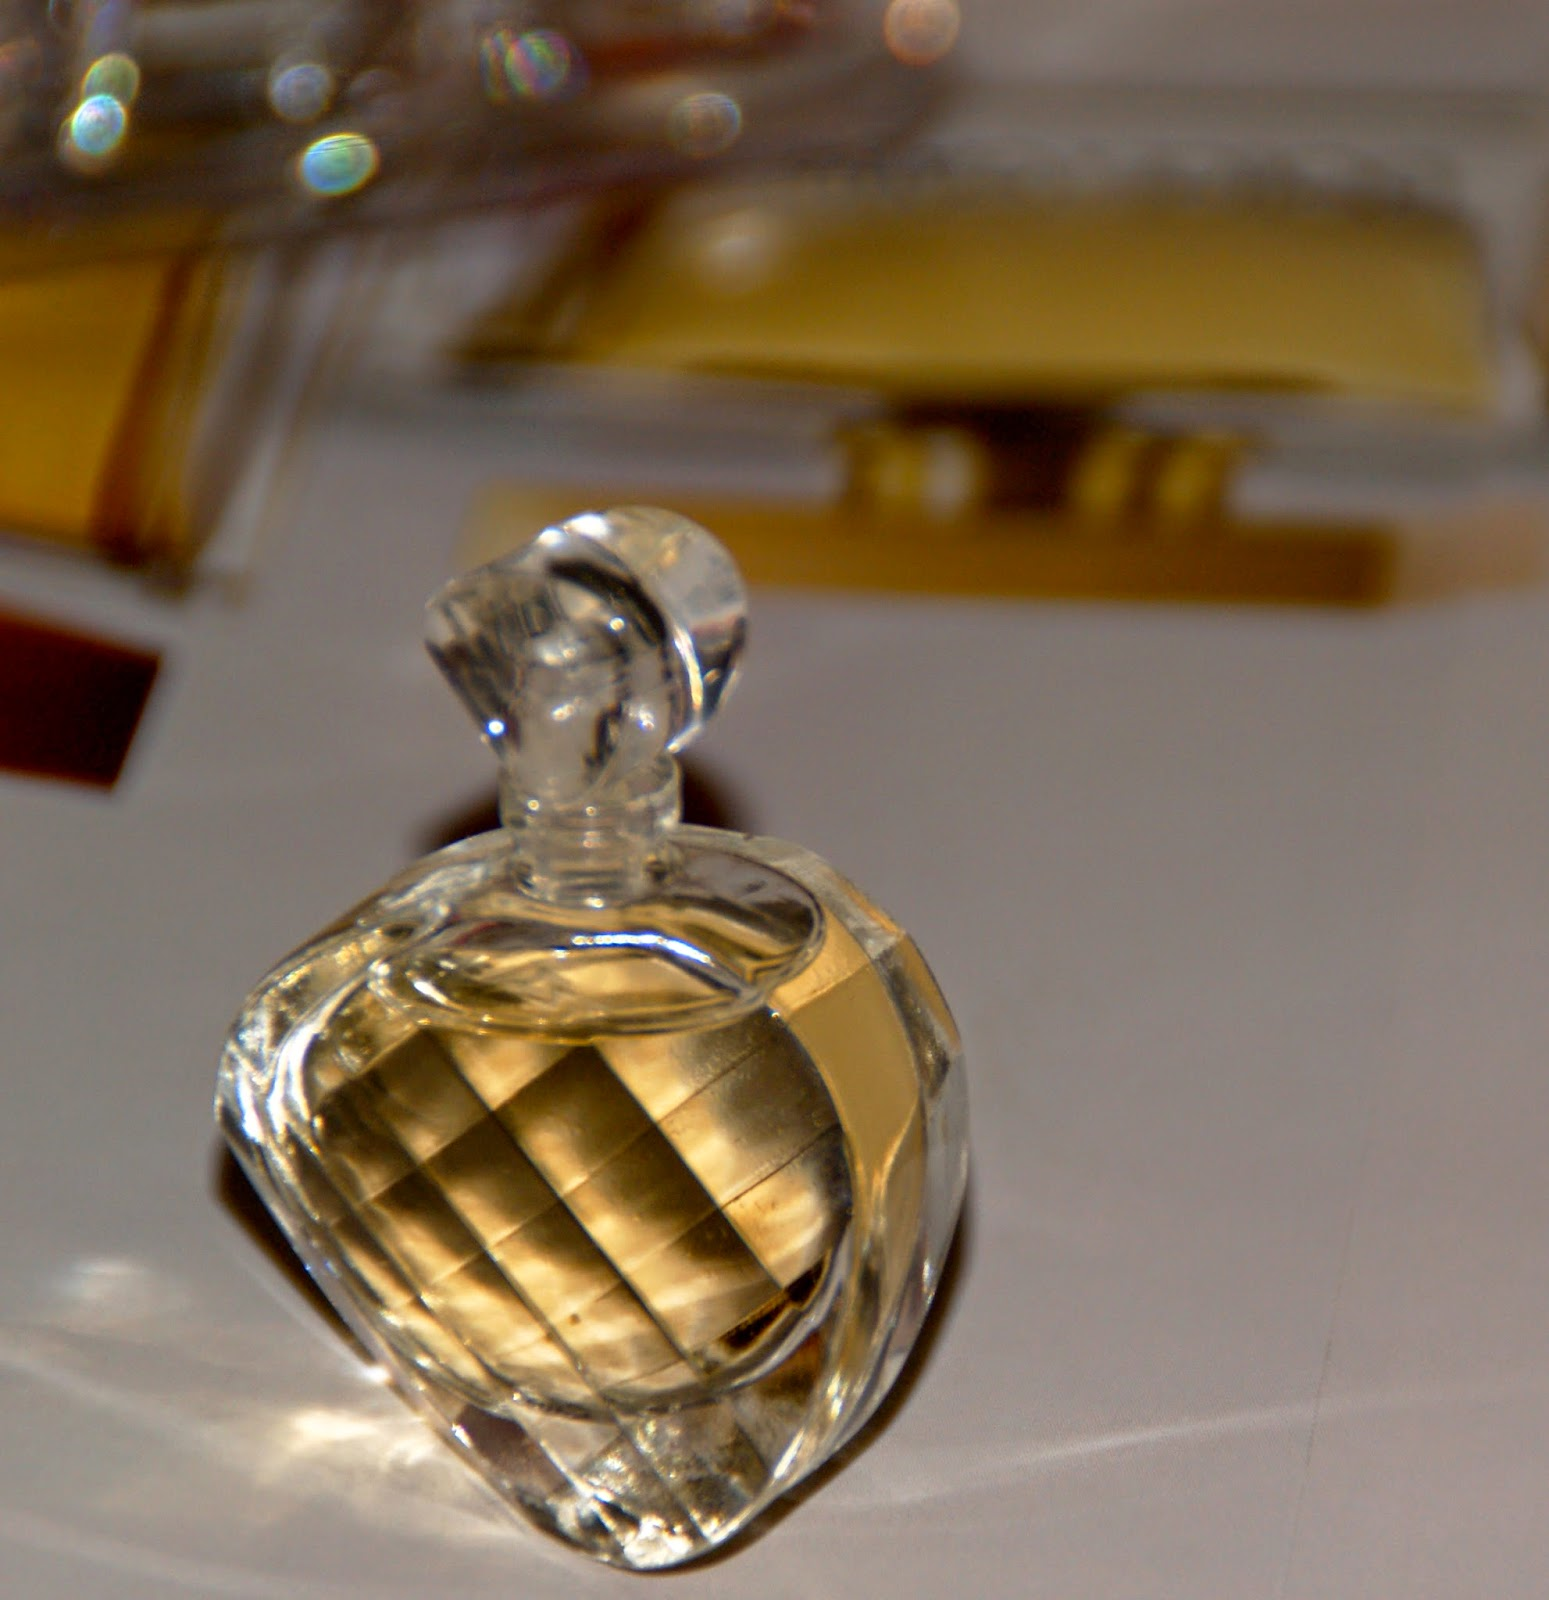 #ElizabethArdenperfumeninasstyleblog #beautyblogger #fragrance